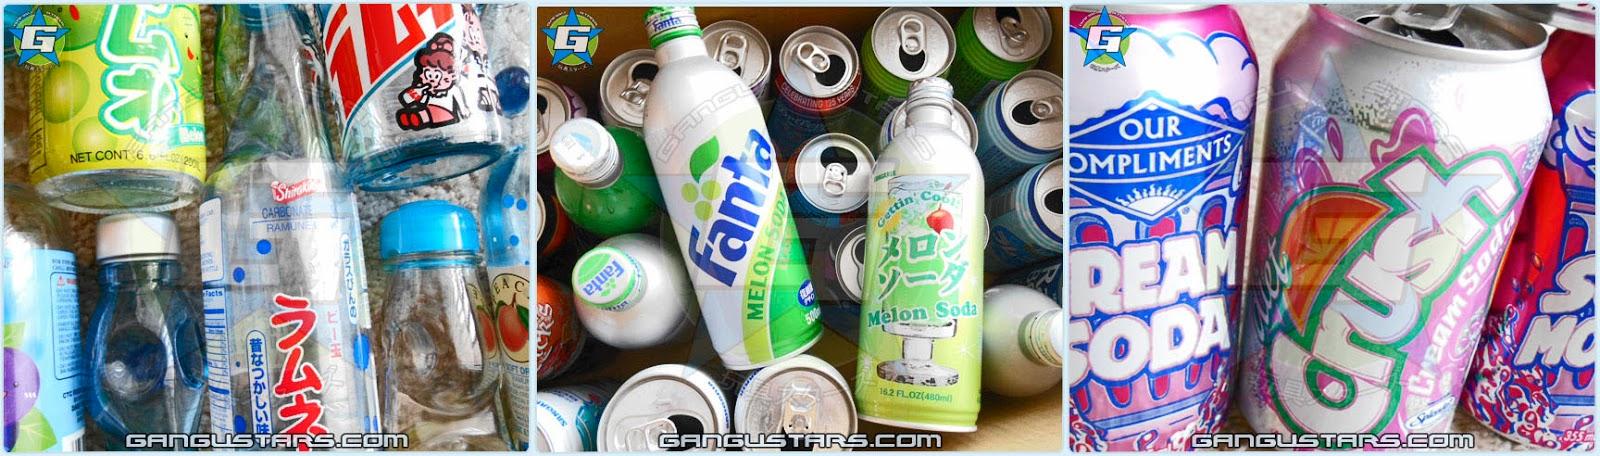 Japanese Ramune soda bottles Creme Soda vanila Fanta soda melon creme Japan